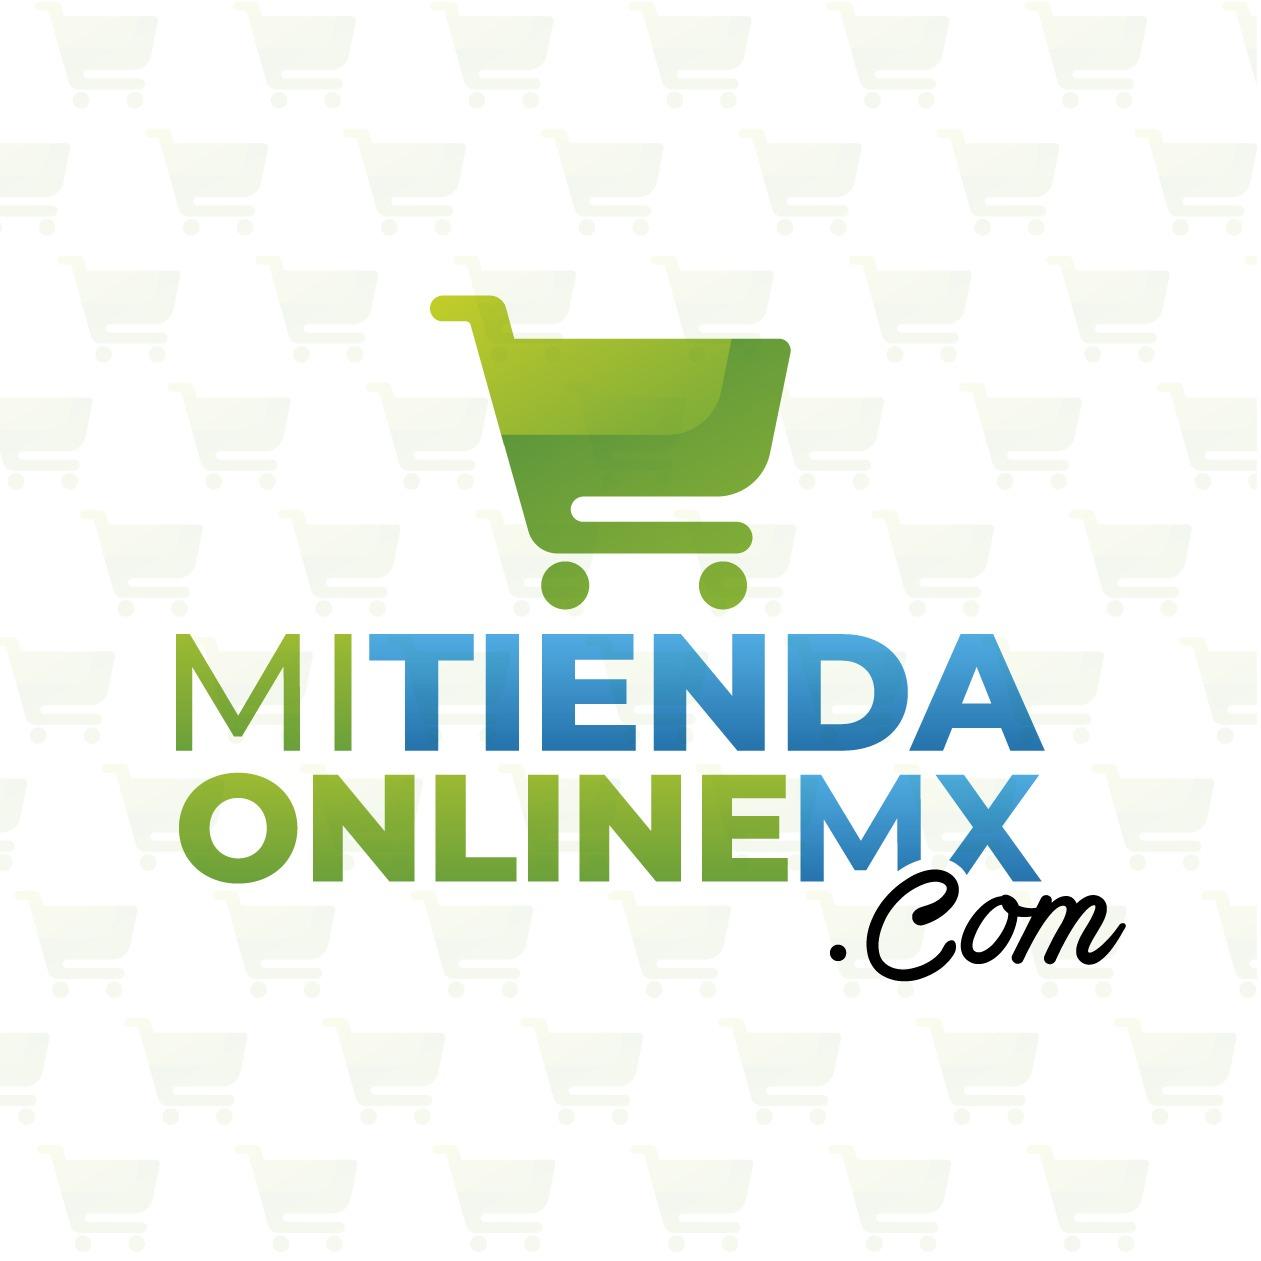 MiTiendaOnlinemx